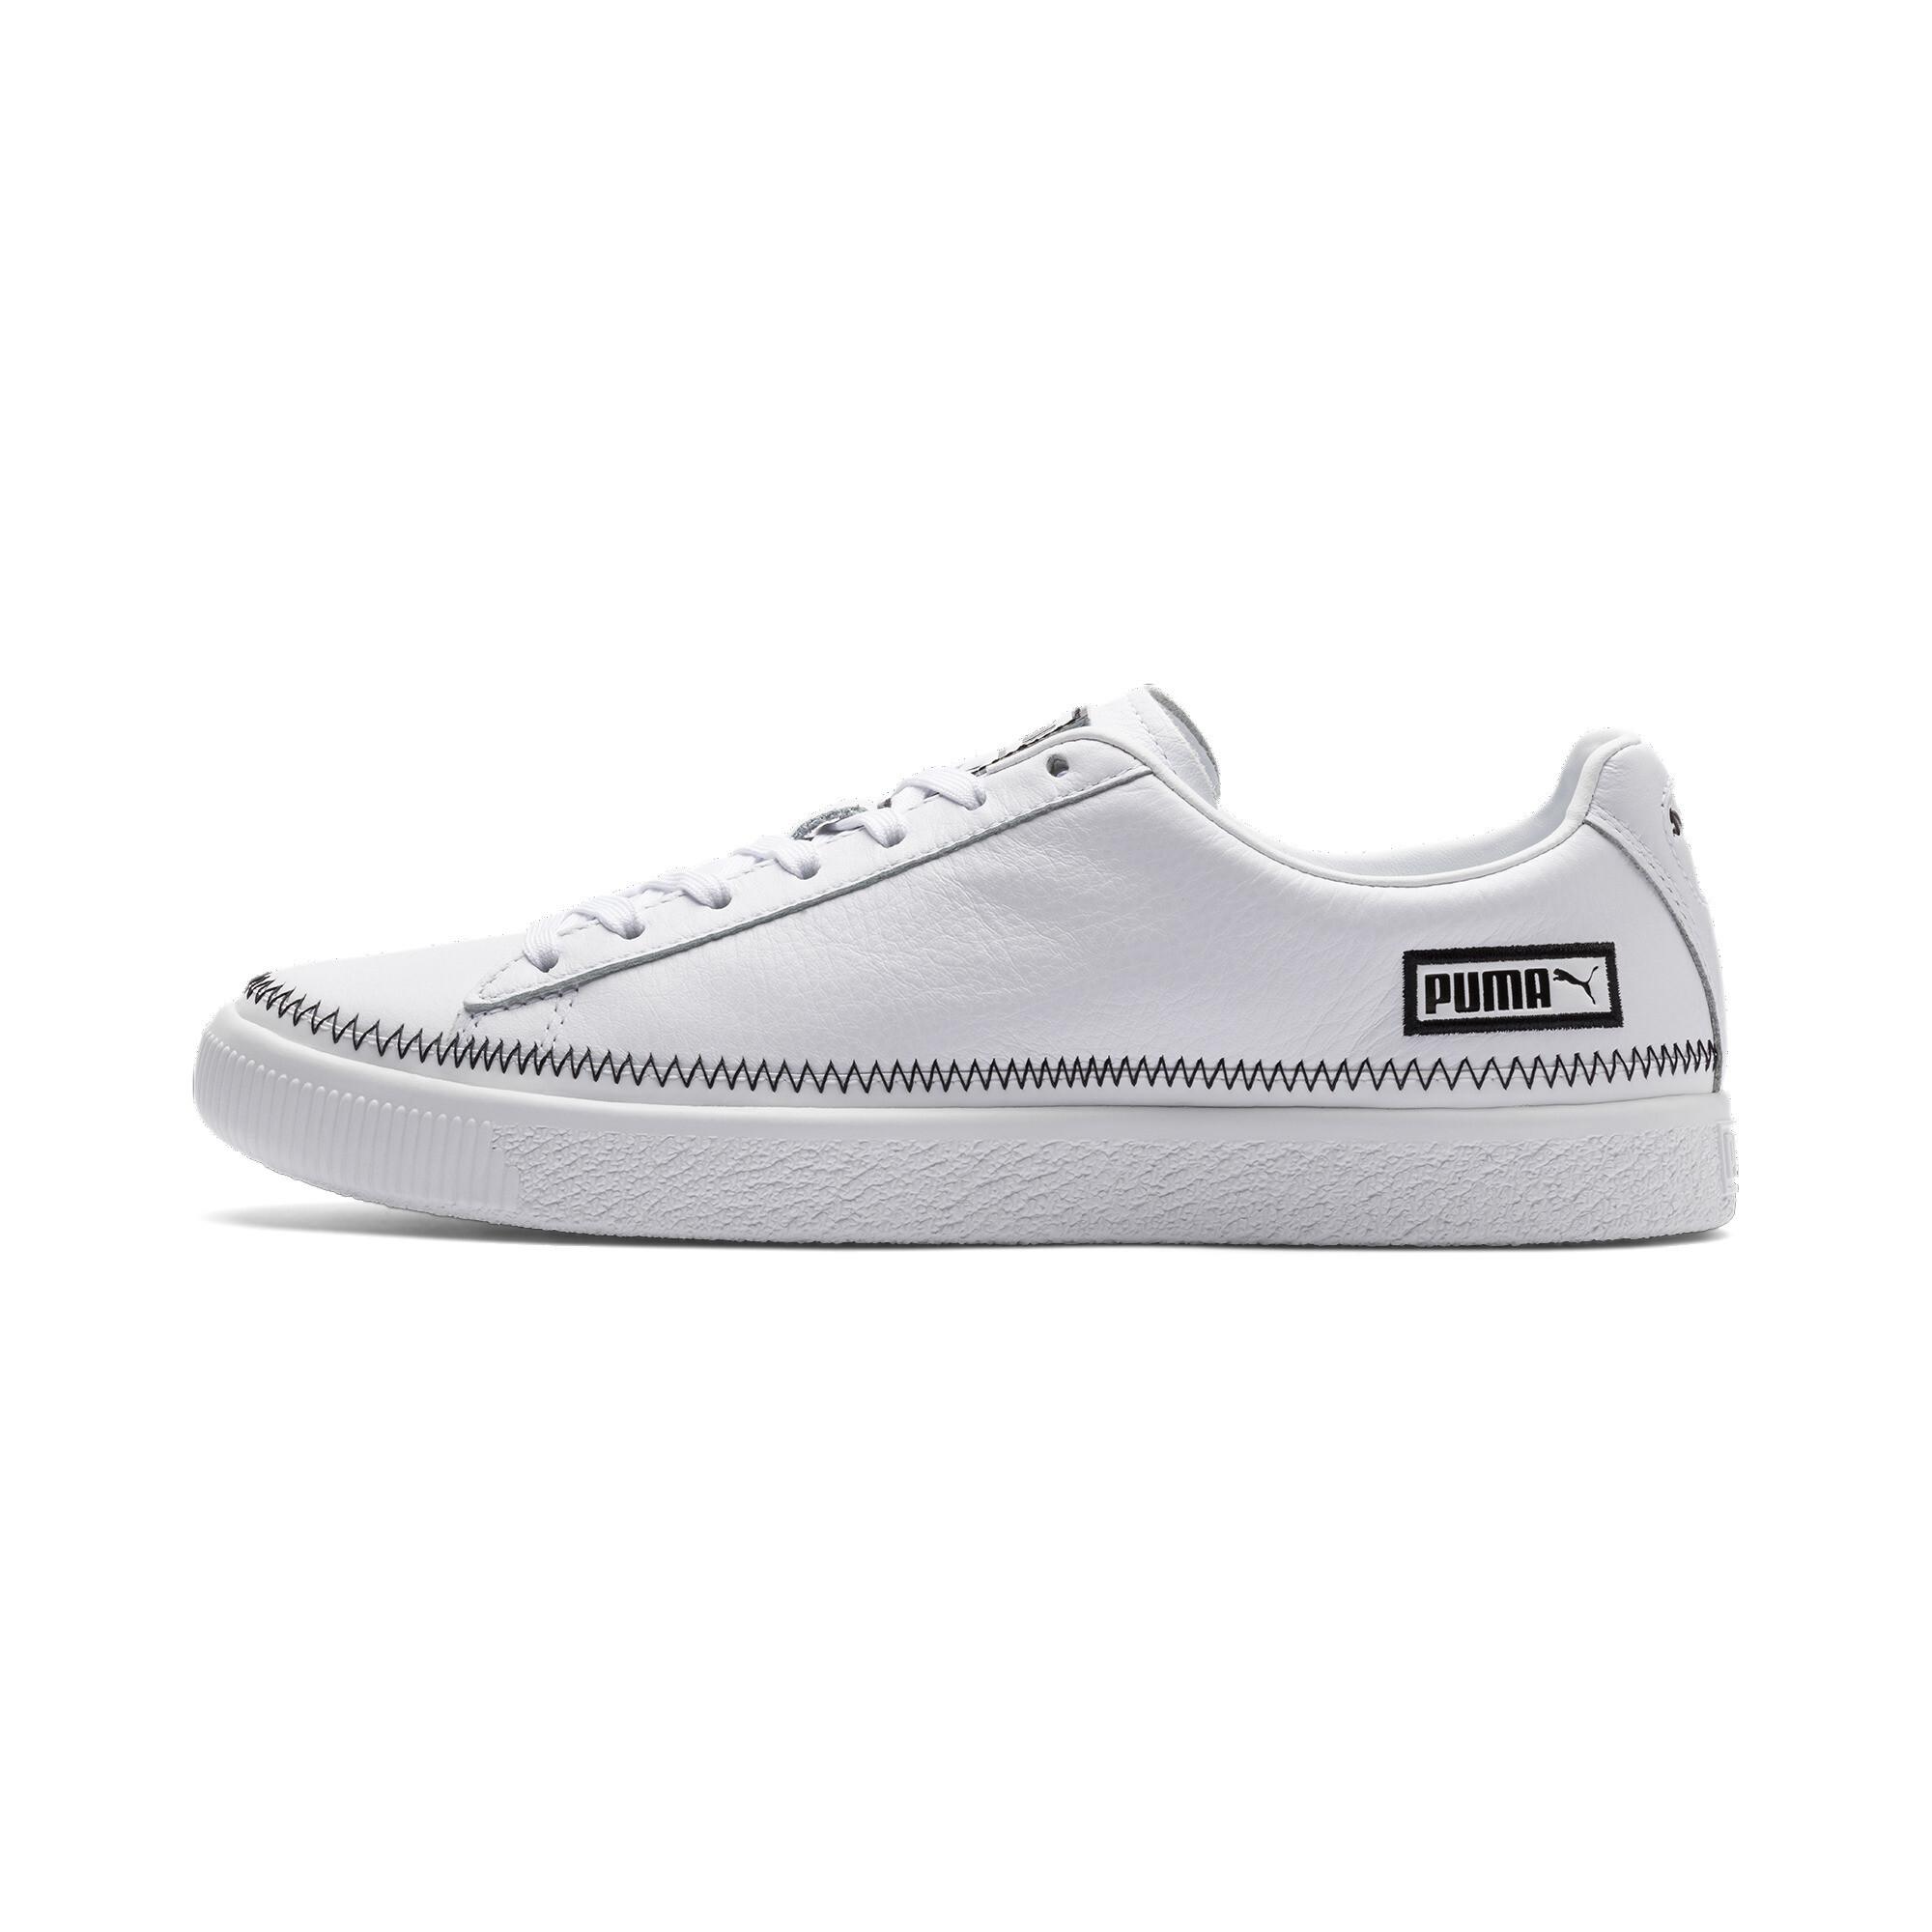 PUMA-Basket-Stitch-Sneaker-Unisex-Schuhe-Neu Indexbild 16